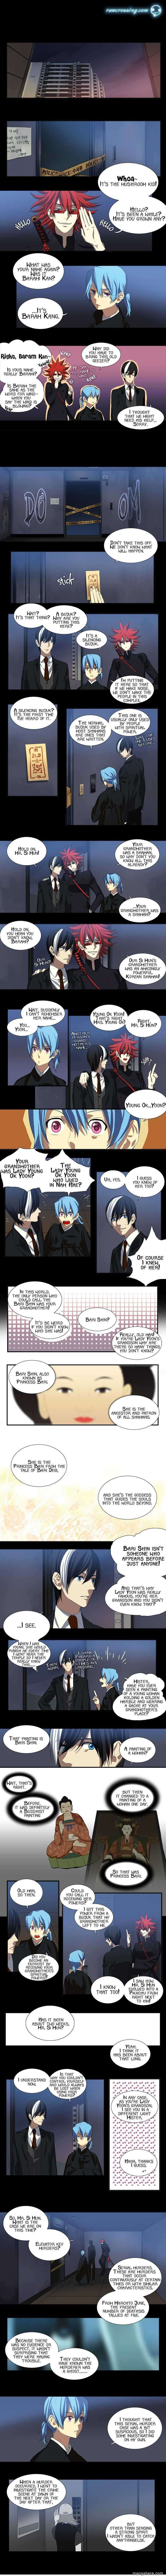 Supernatural Investigation Department 22 Page 2